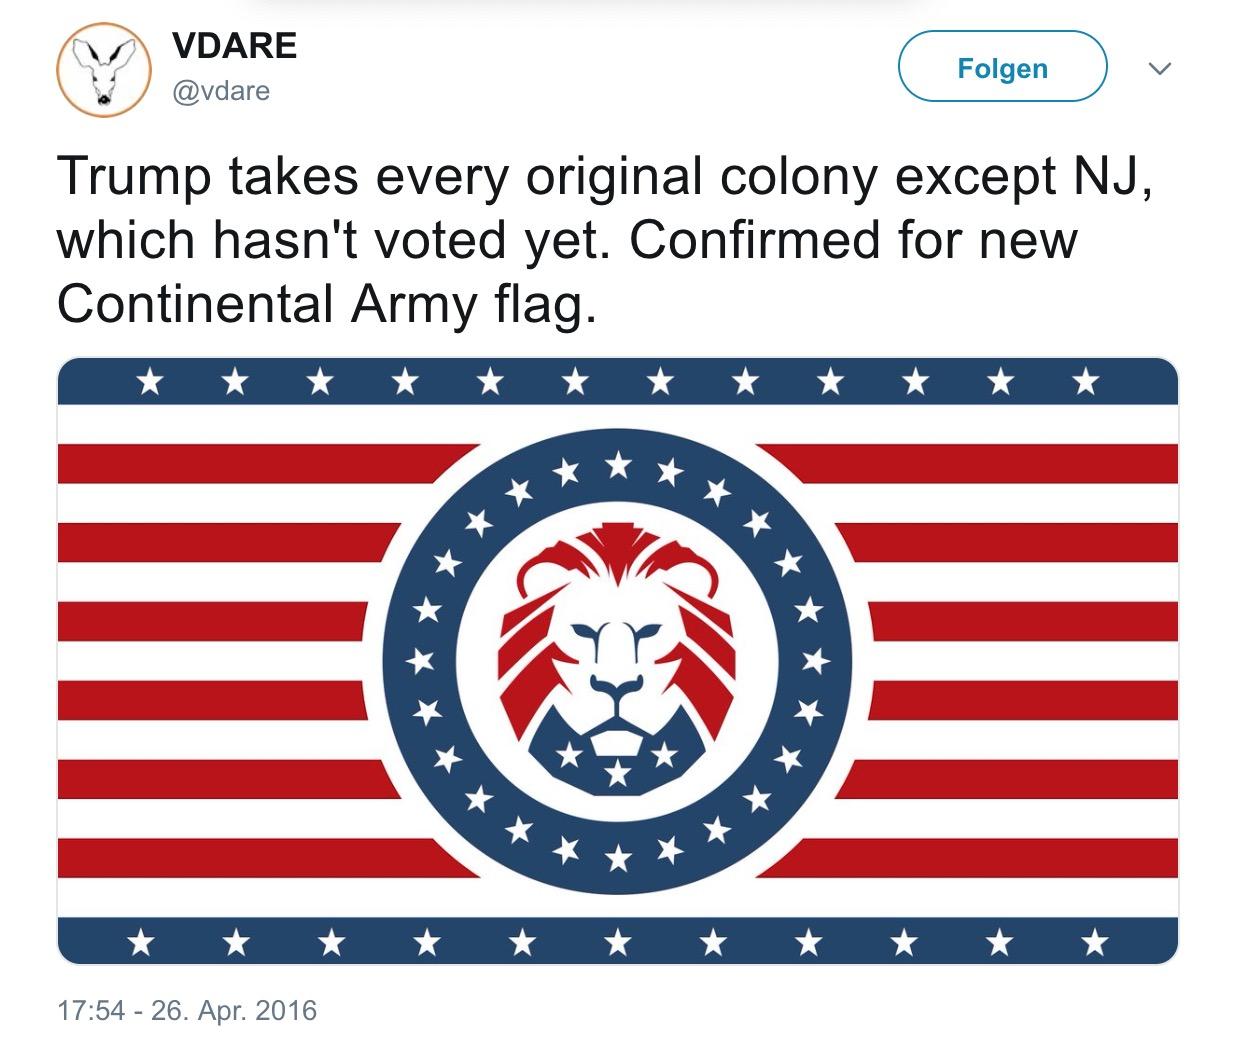 Trump Pence Logo Same As White Supremacy Logo